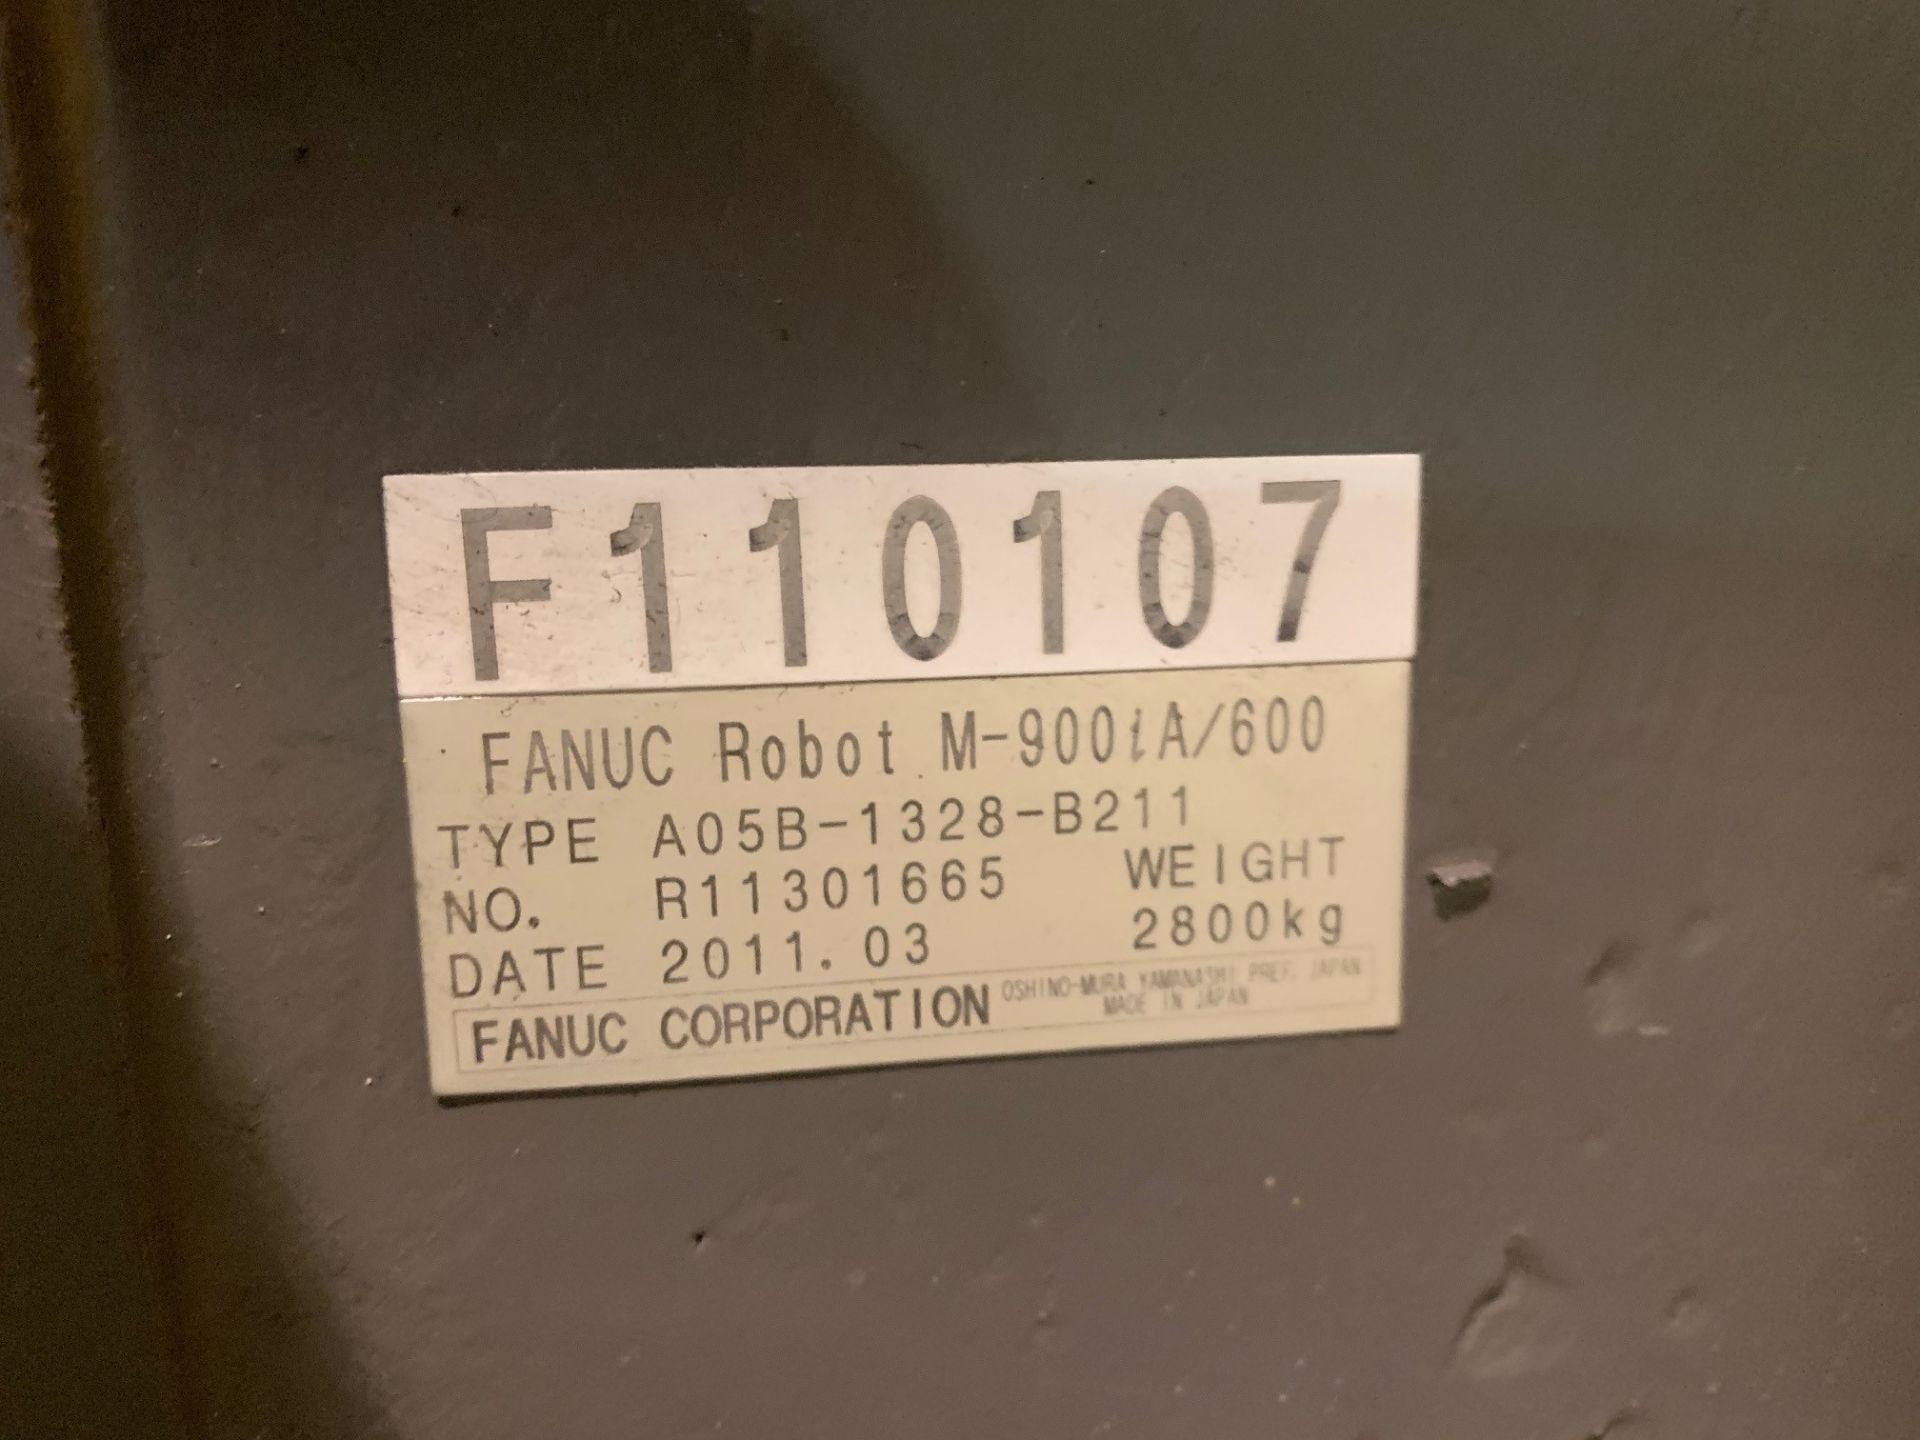 Lot 8 - FANUC ROBOT M-900iA/600 WITH R-30iA CONTROL, YEAR 2011, SN 110107